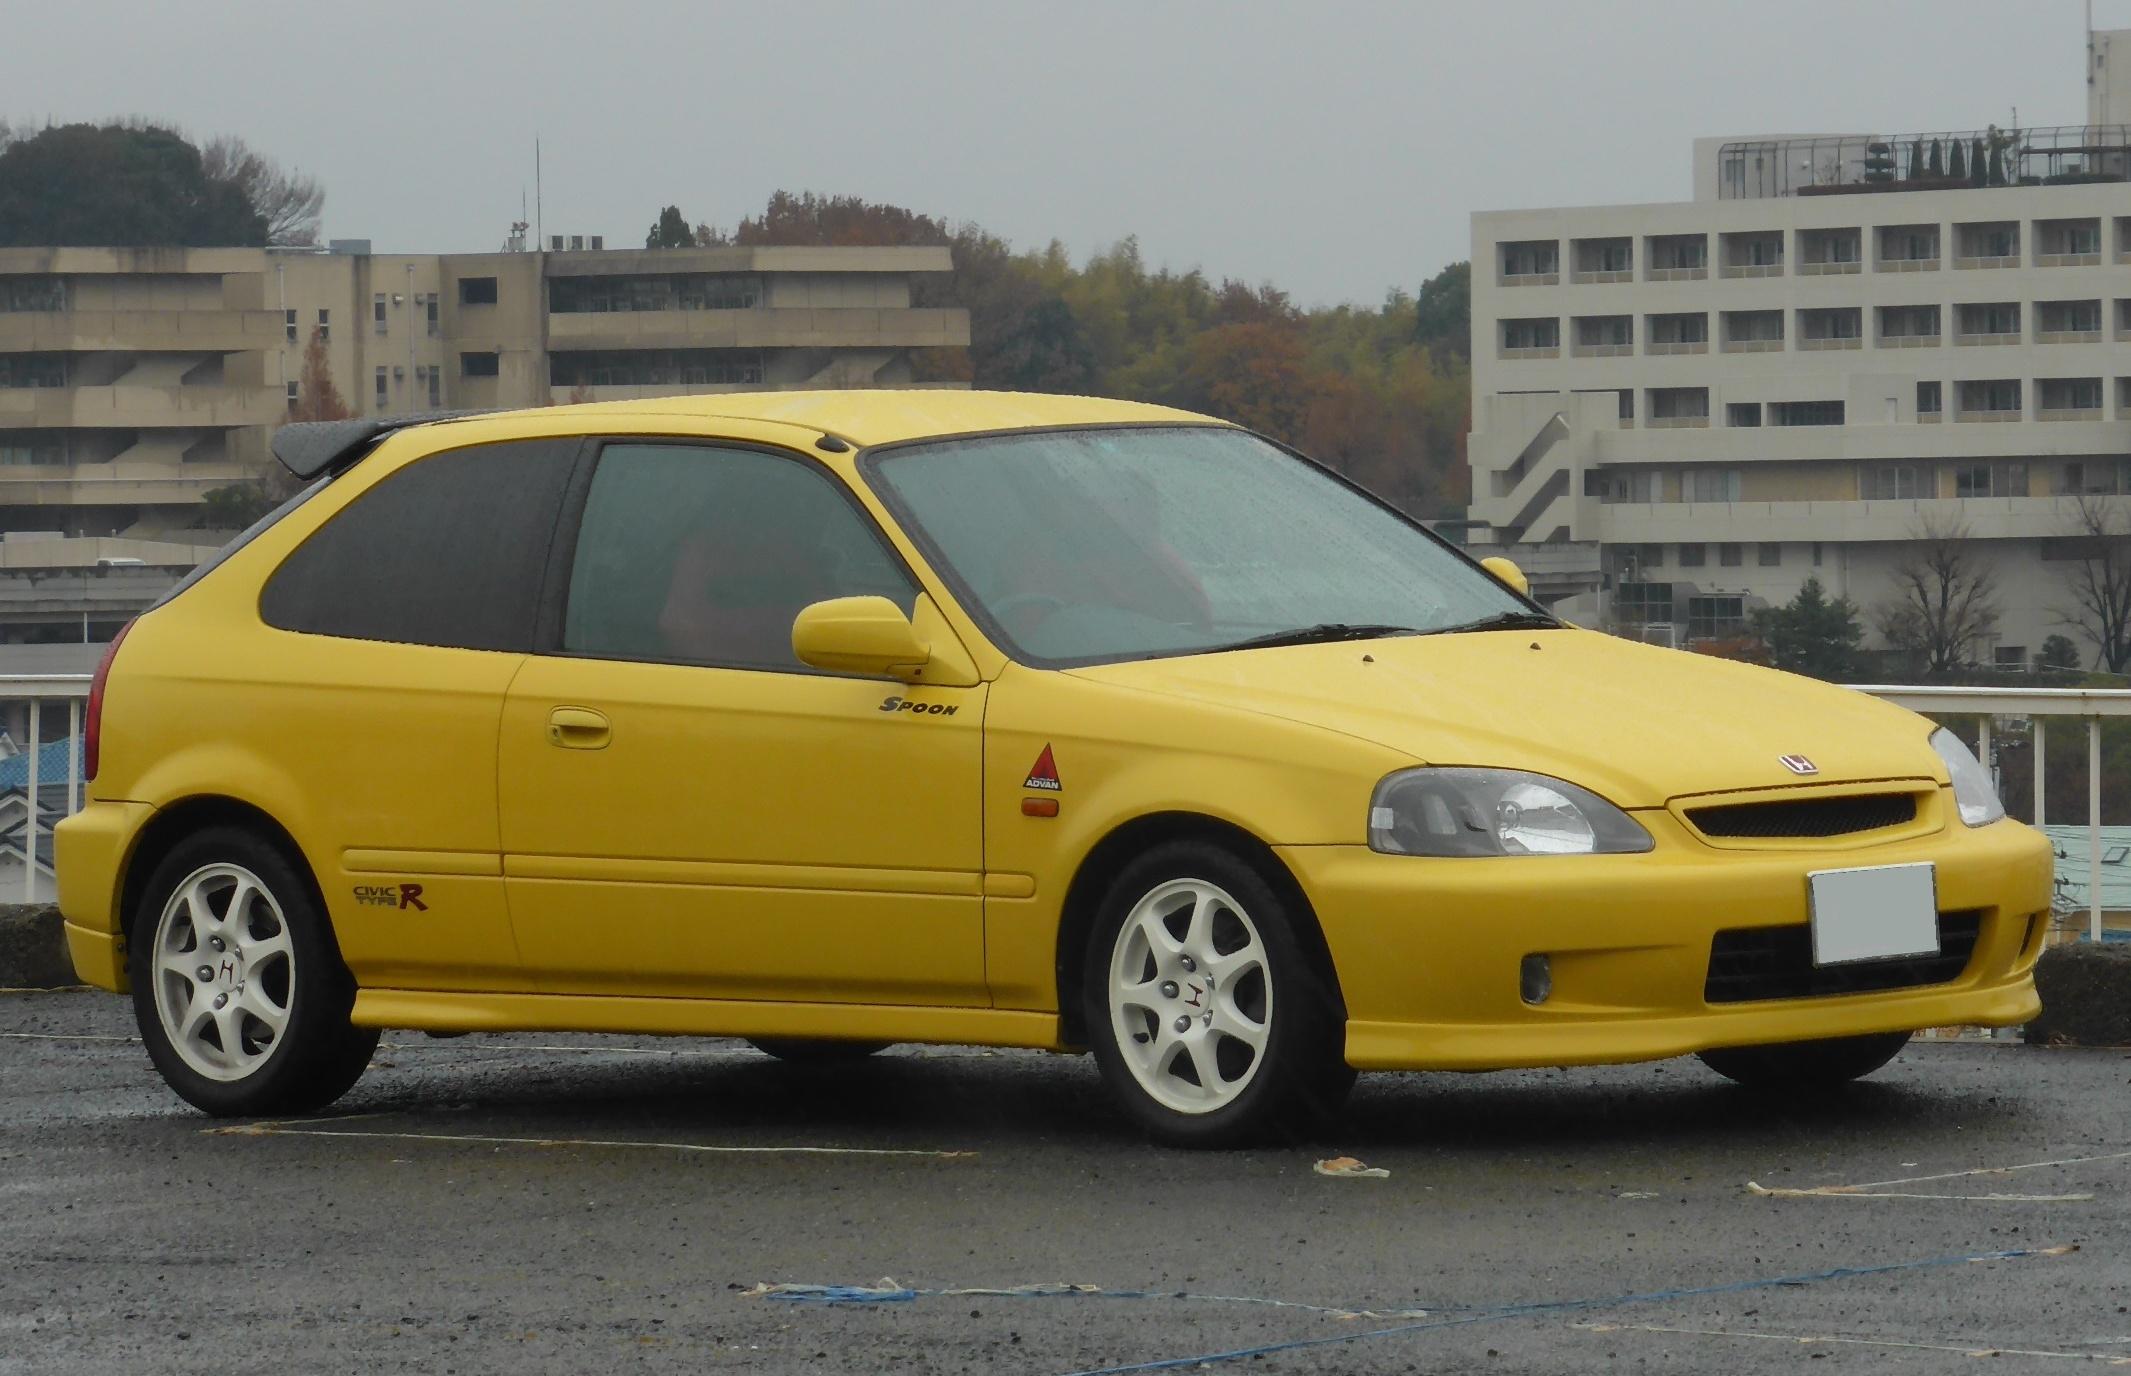 Kelebihan Kekurangan Civic Type R Ek9 Tangguh